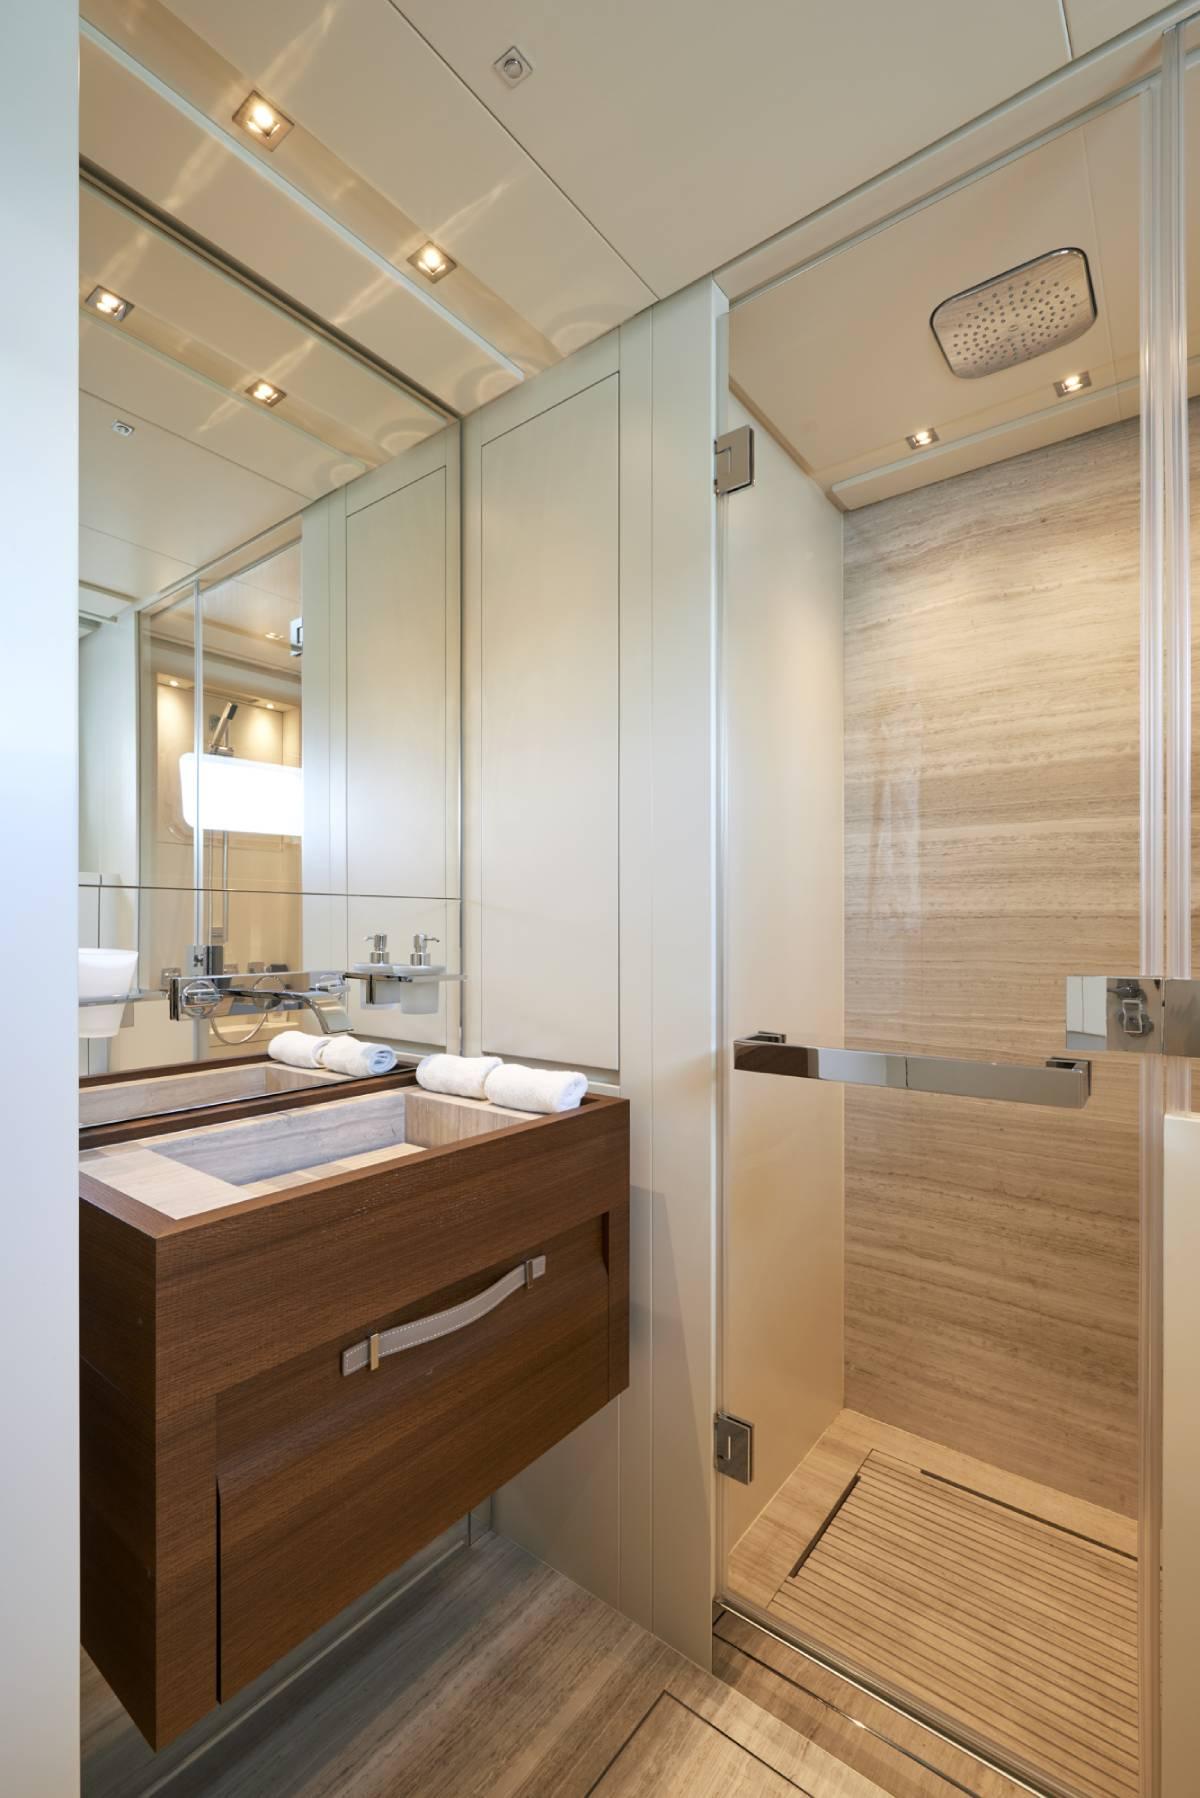 SL106.642_Sanlorenz_toilet